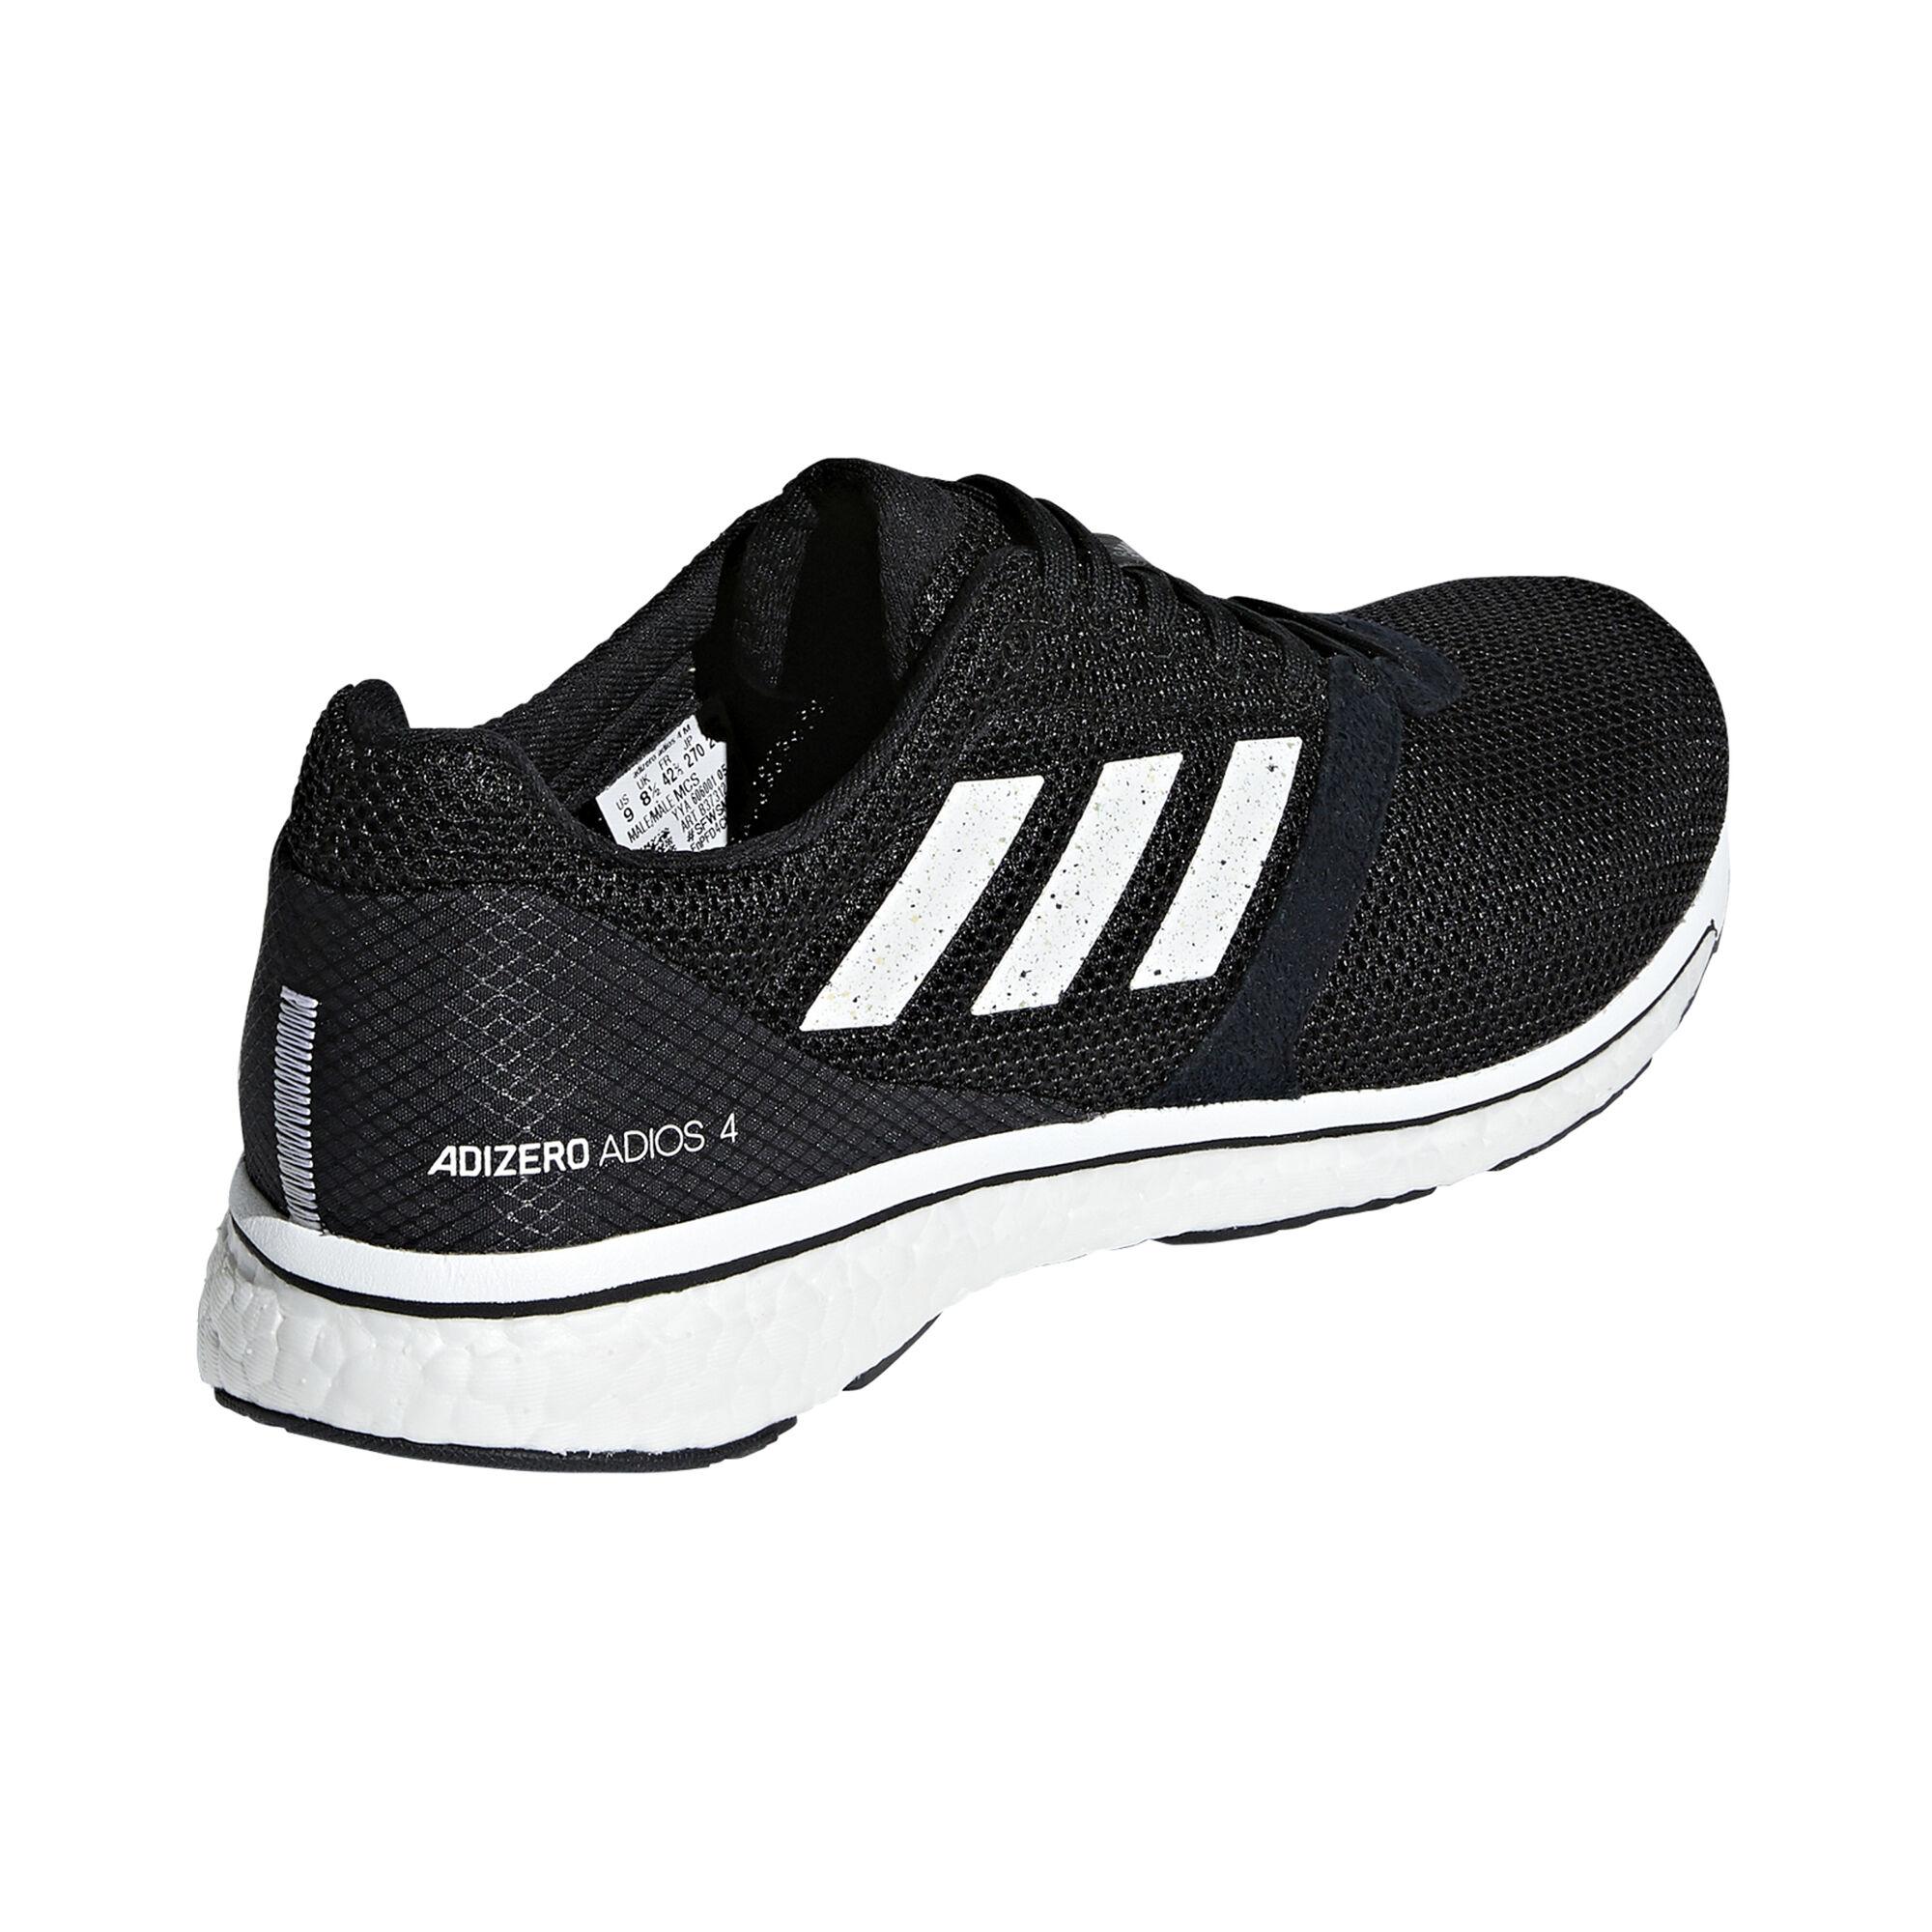 watch 1c403 c39ae ... adidas adidas adidas adidas adidas adidas. Adizero Adios 4 ...